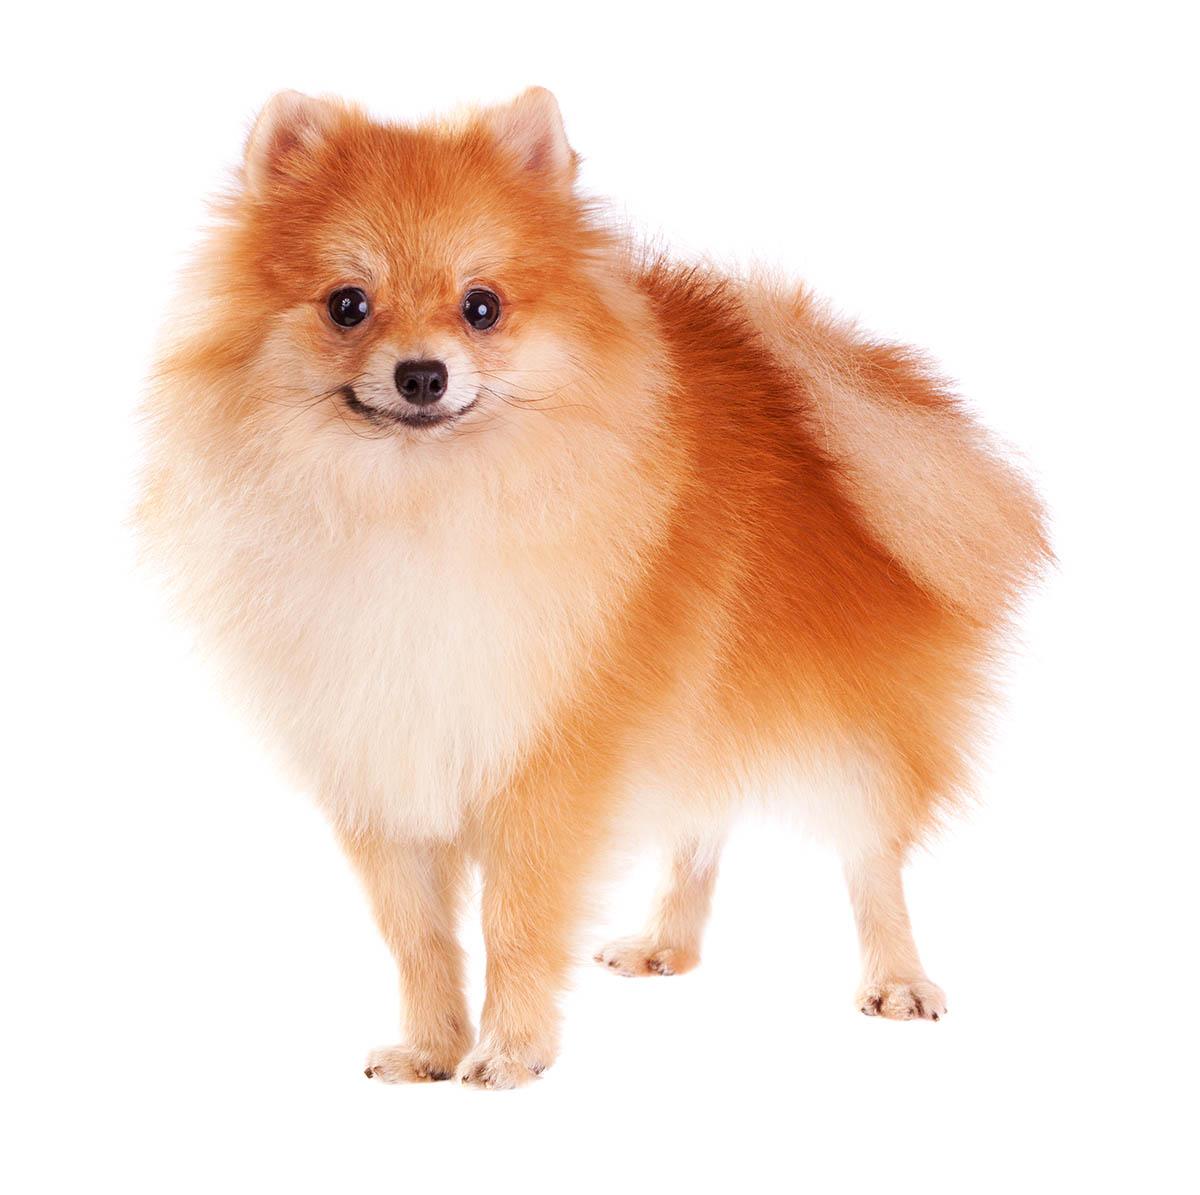 Golden Retriever dog breed information.